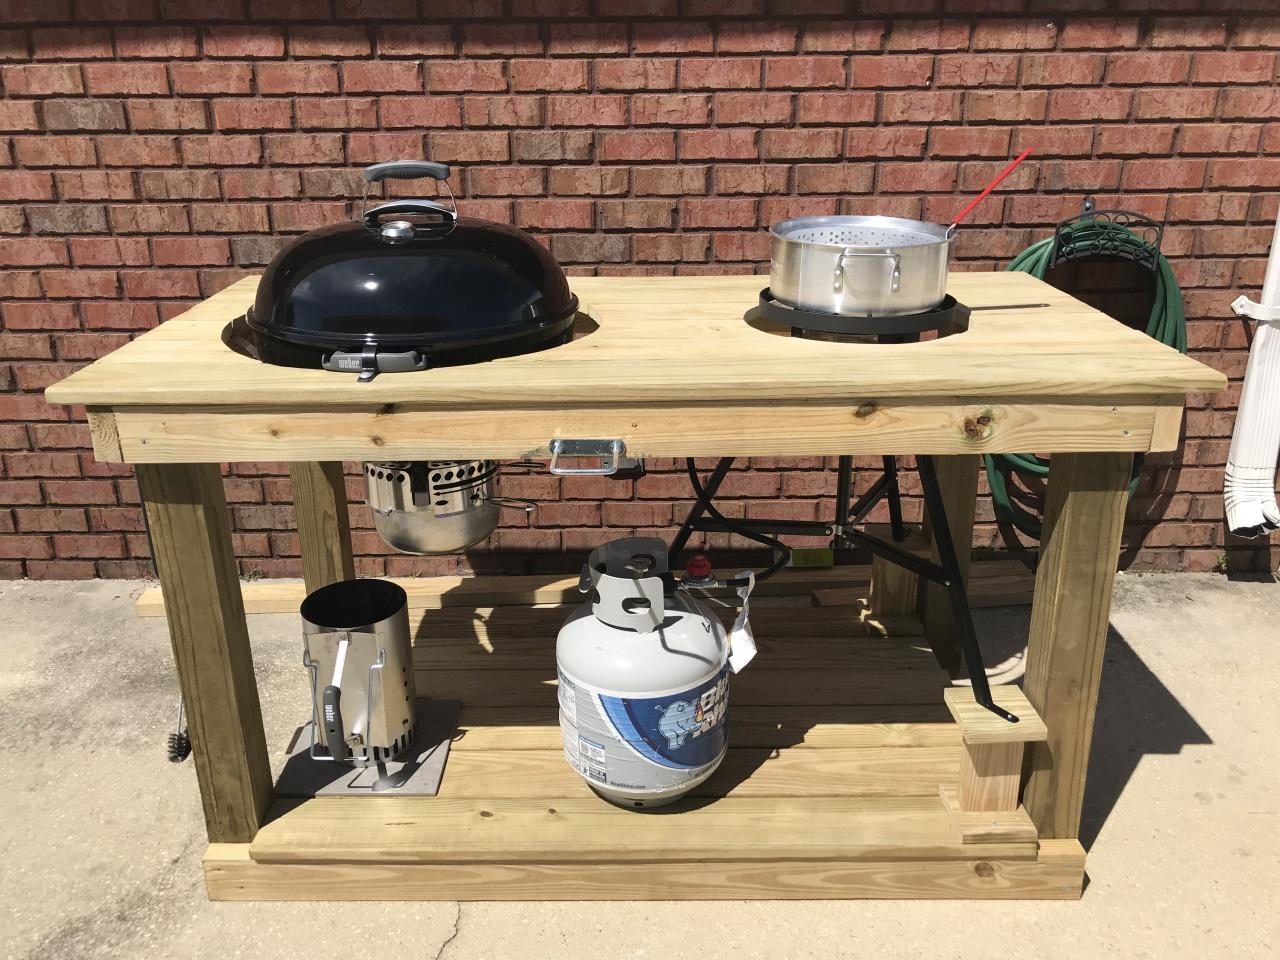 Redneck outdoor kitchen-c42863d7-66bb-4aa8-b0bf-e6fcda59c4f6-jpg